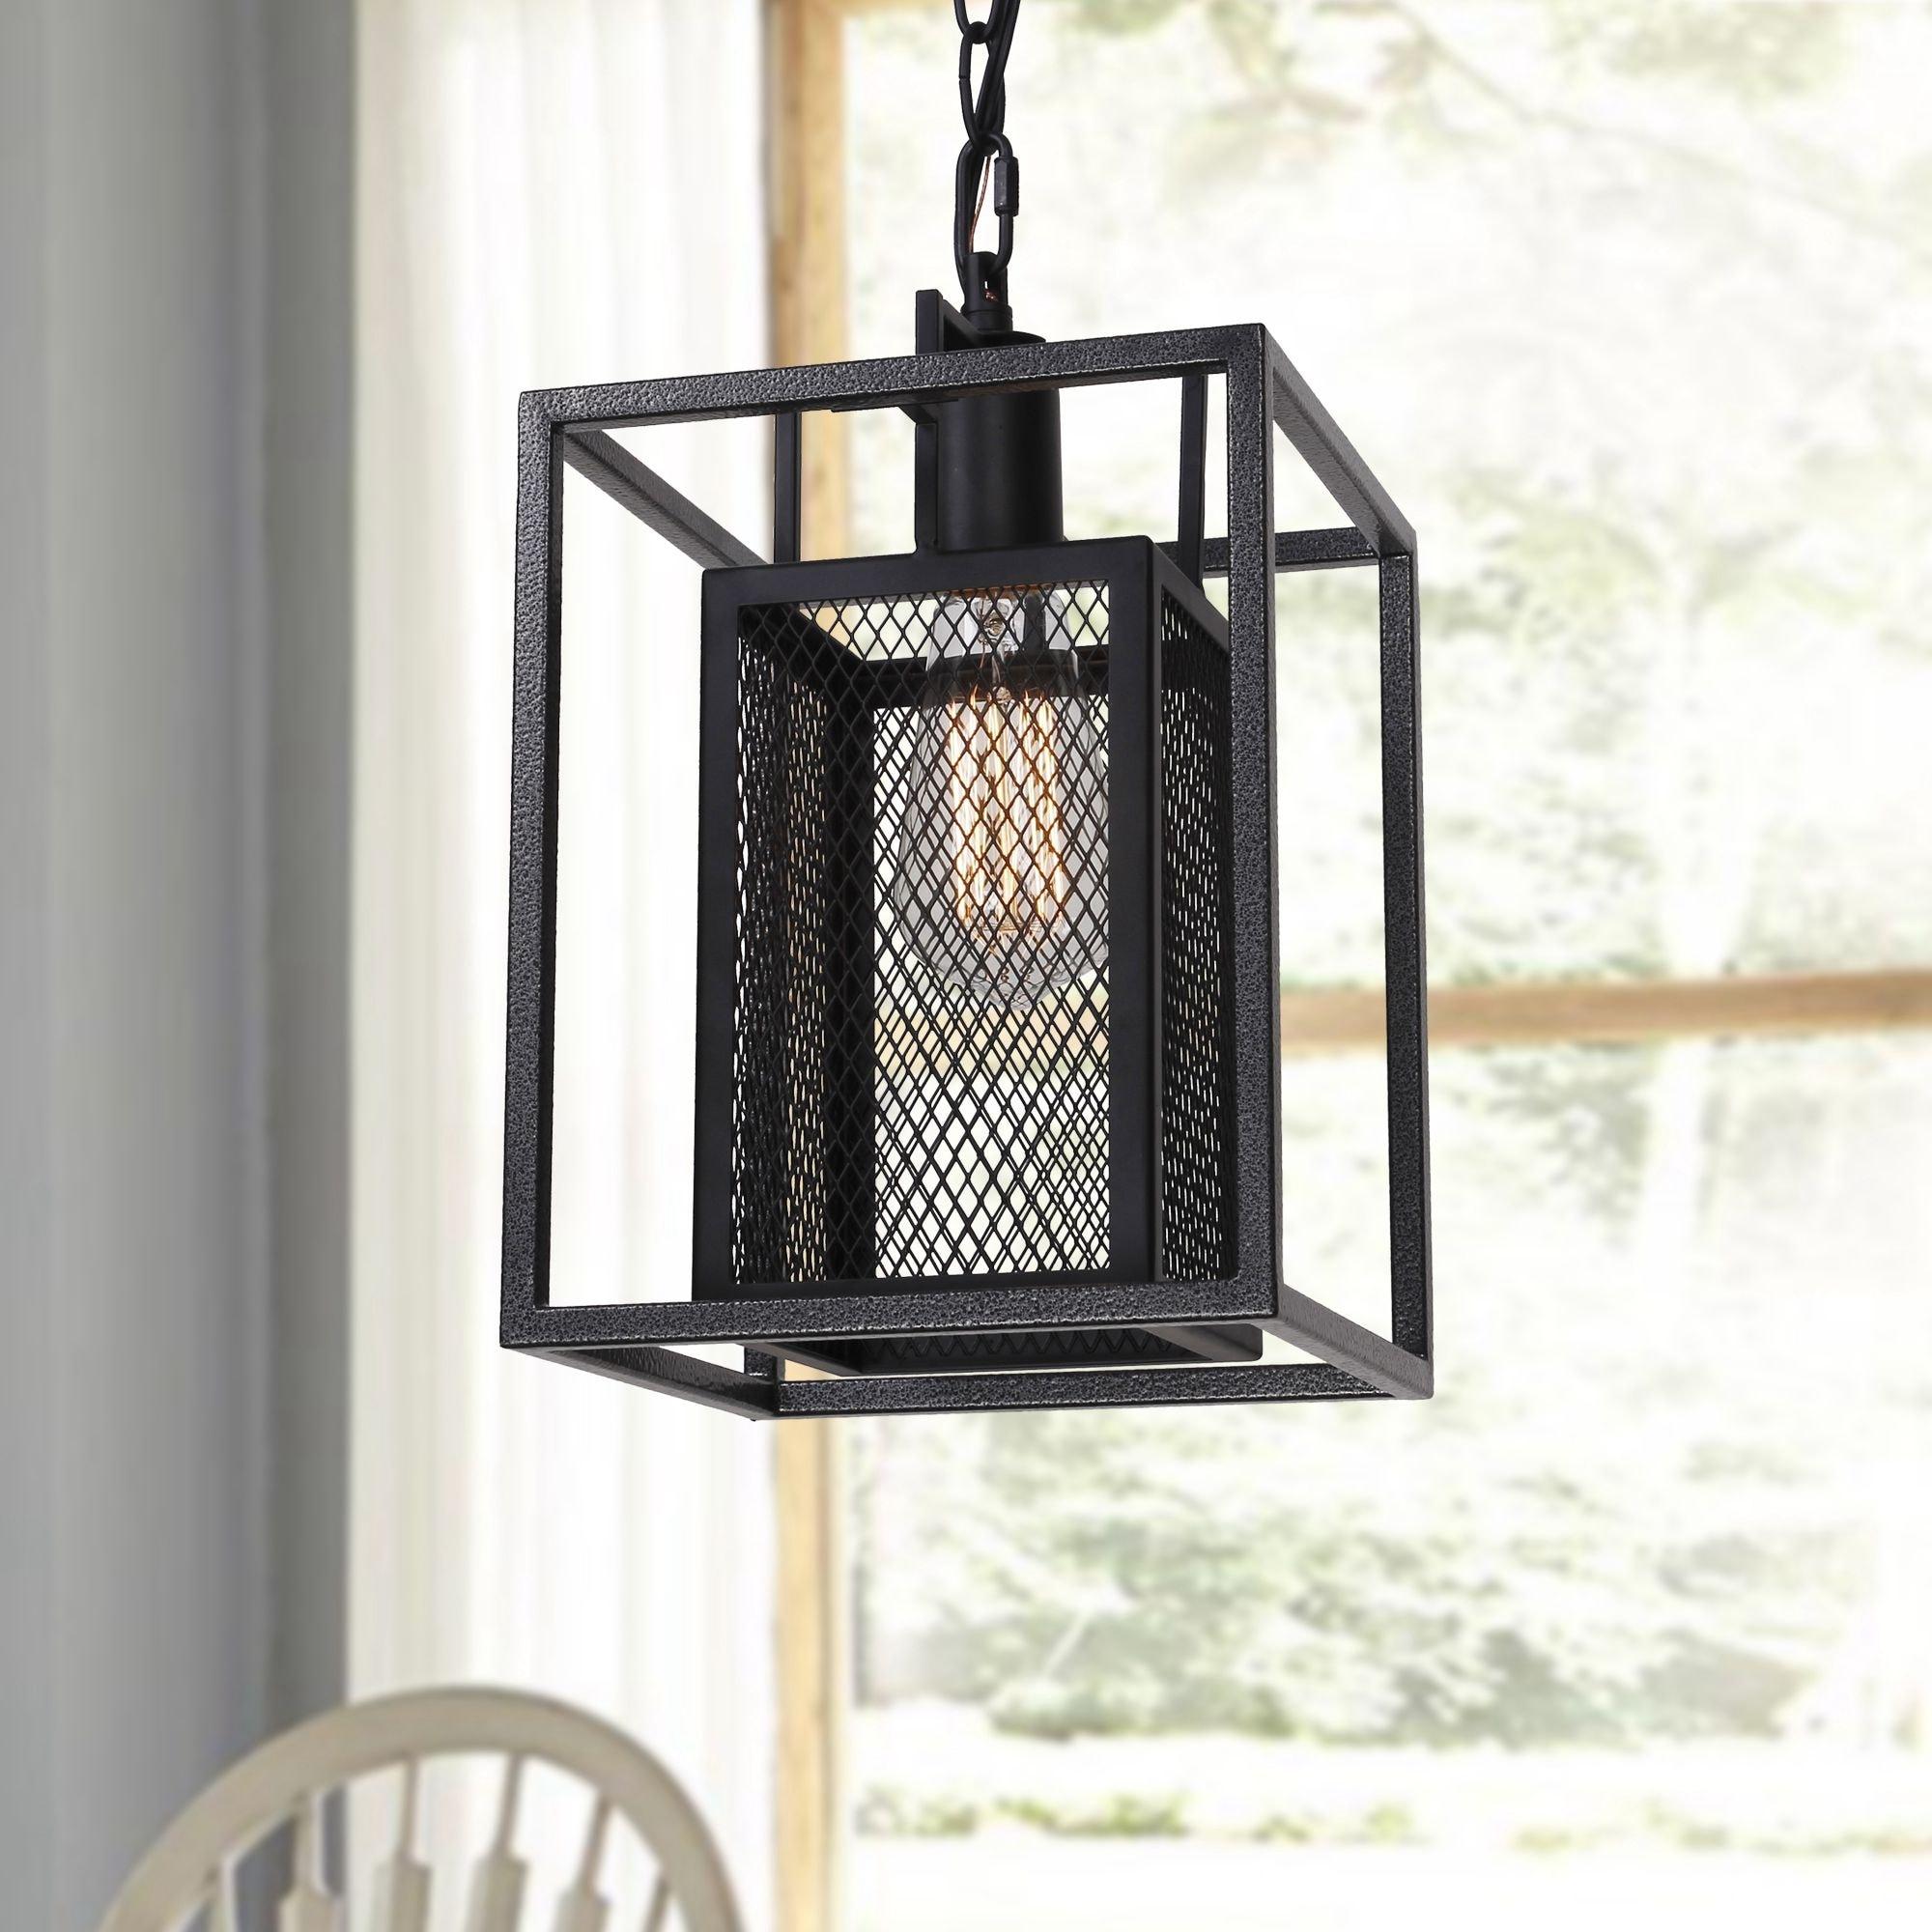 Shop Vintage Industrial Black Iron 1-Light Pendant Light for Kitchen ...